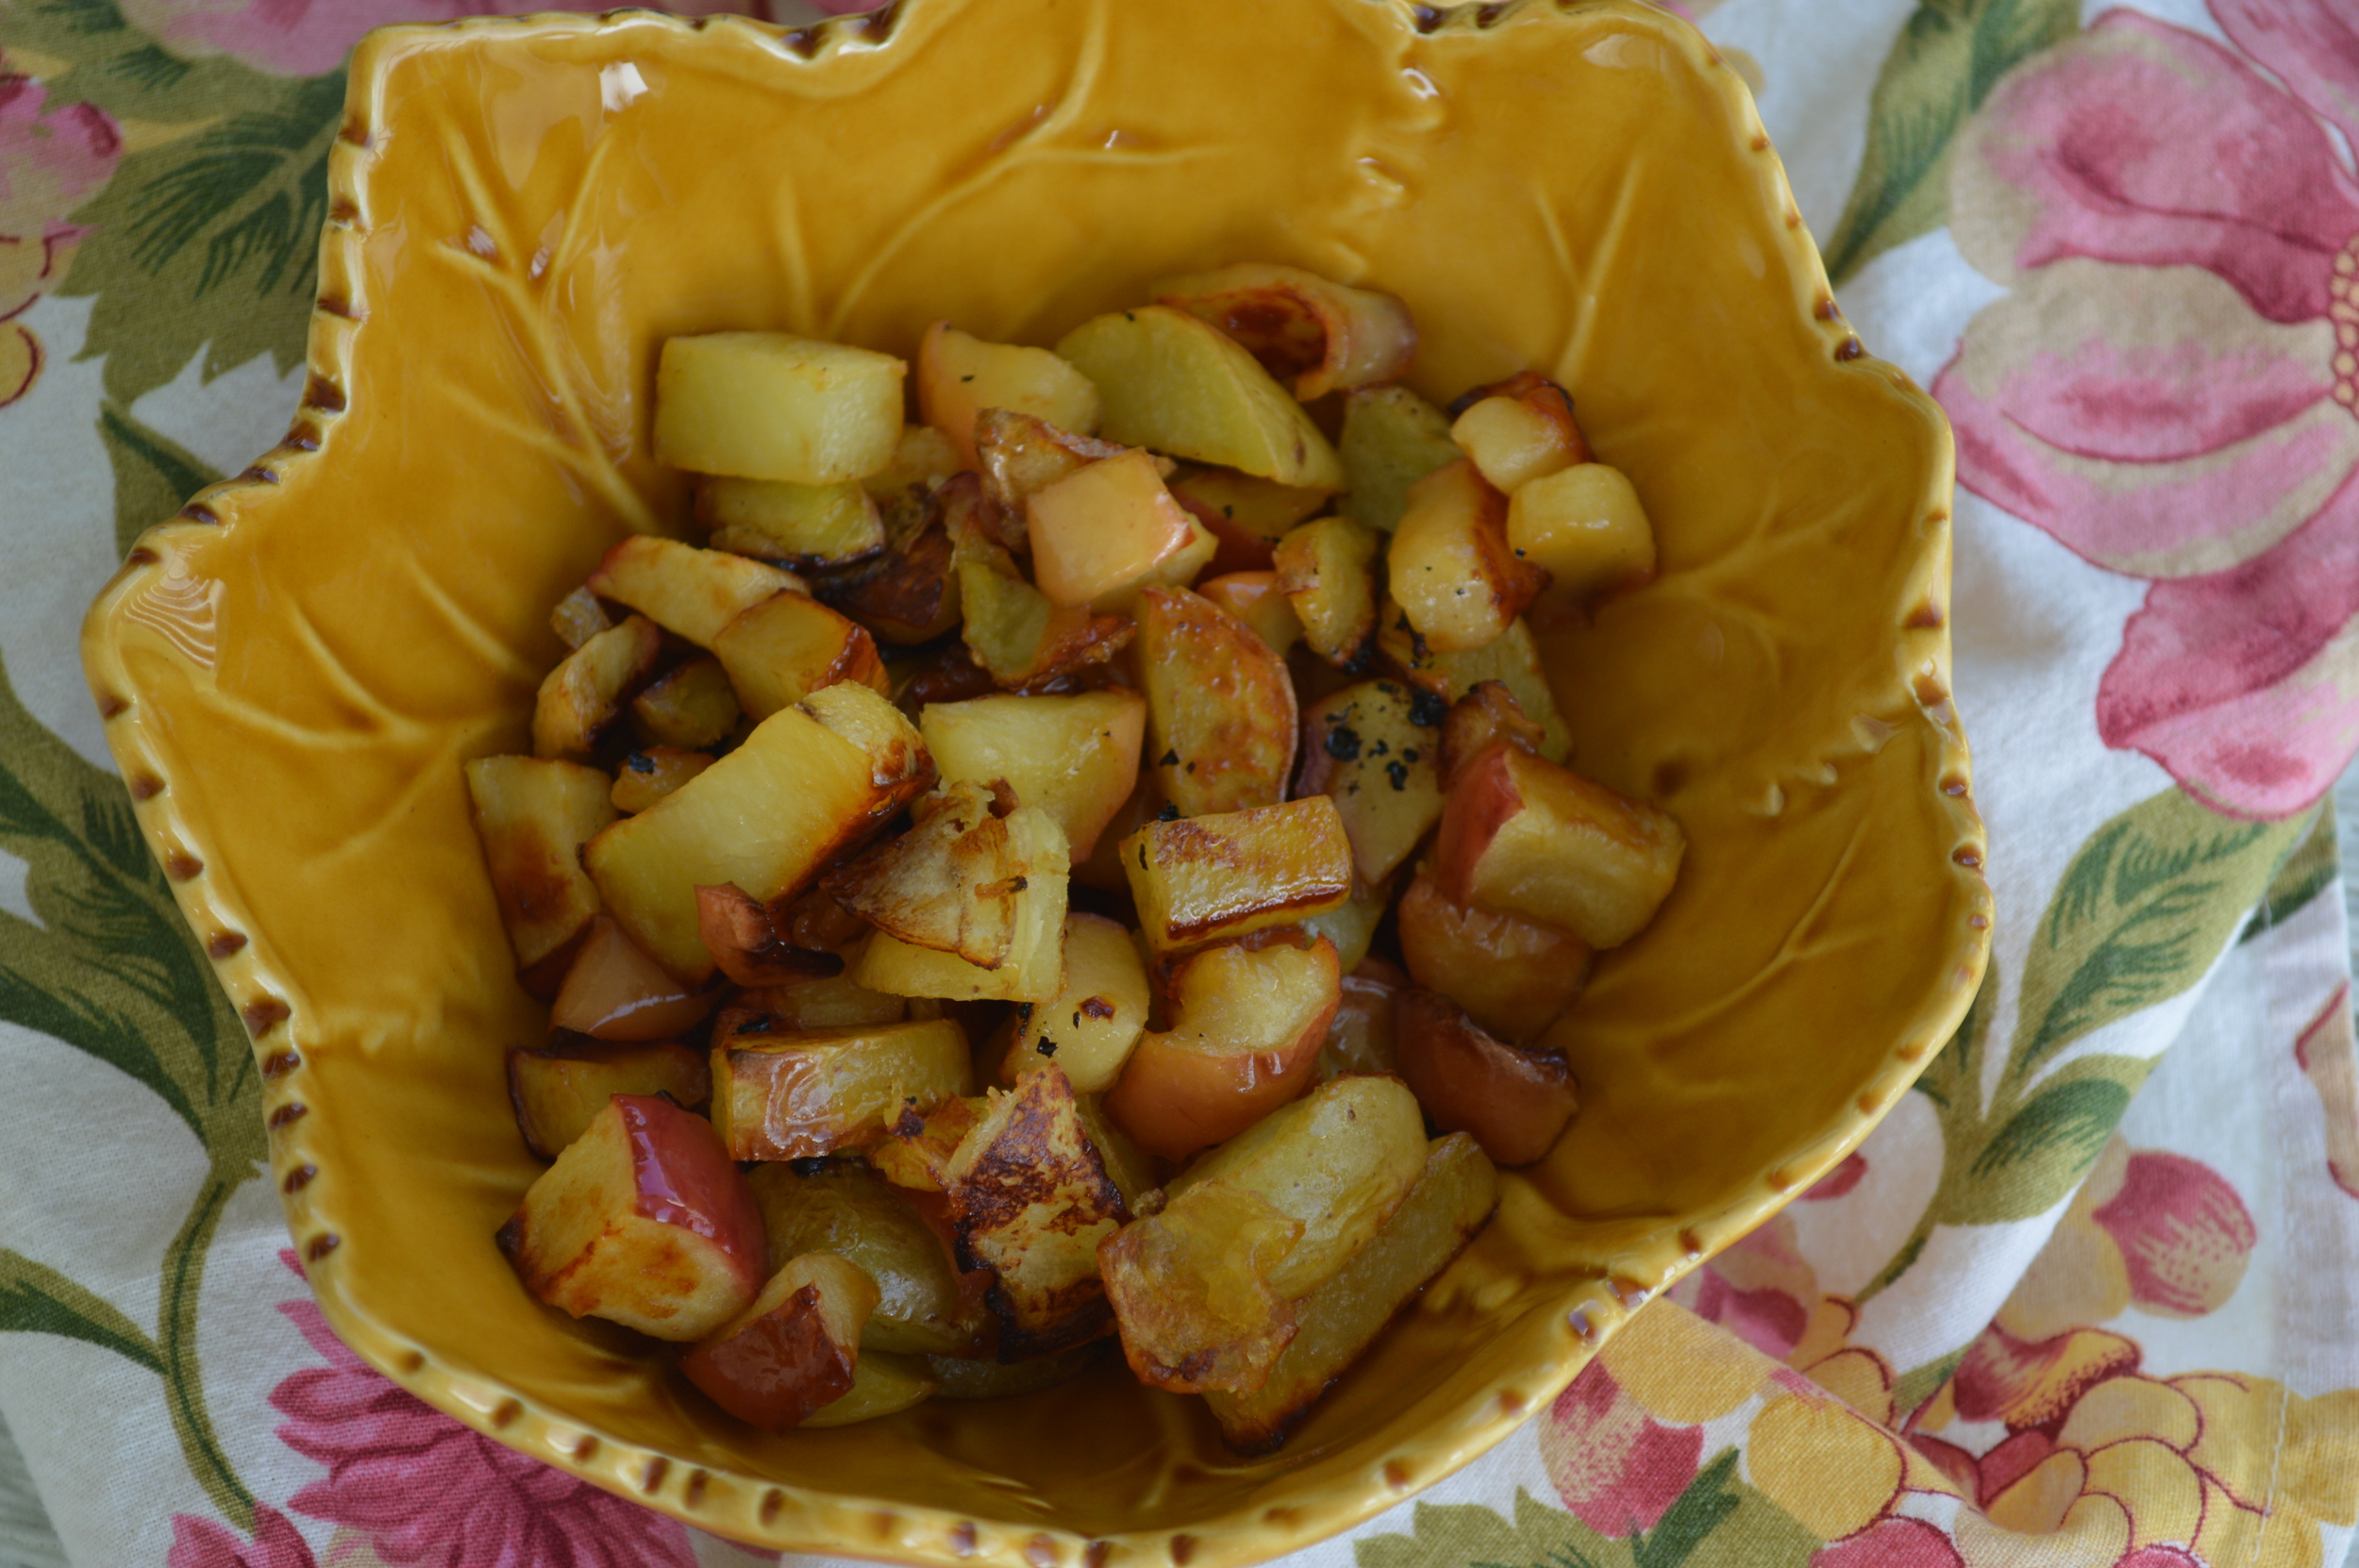 Honey Roasted Potatoes & Apples